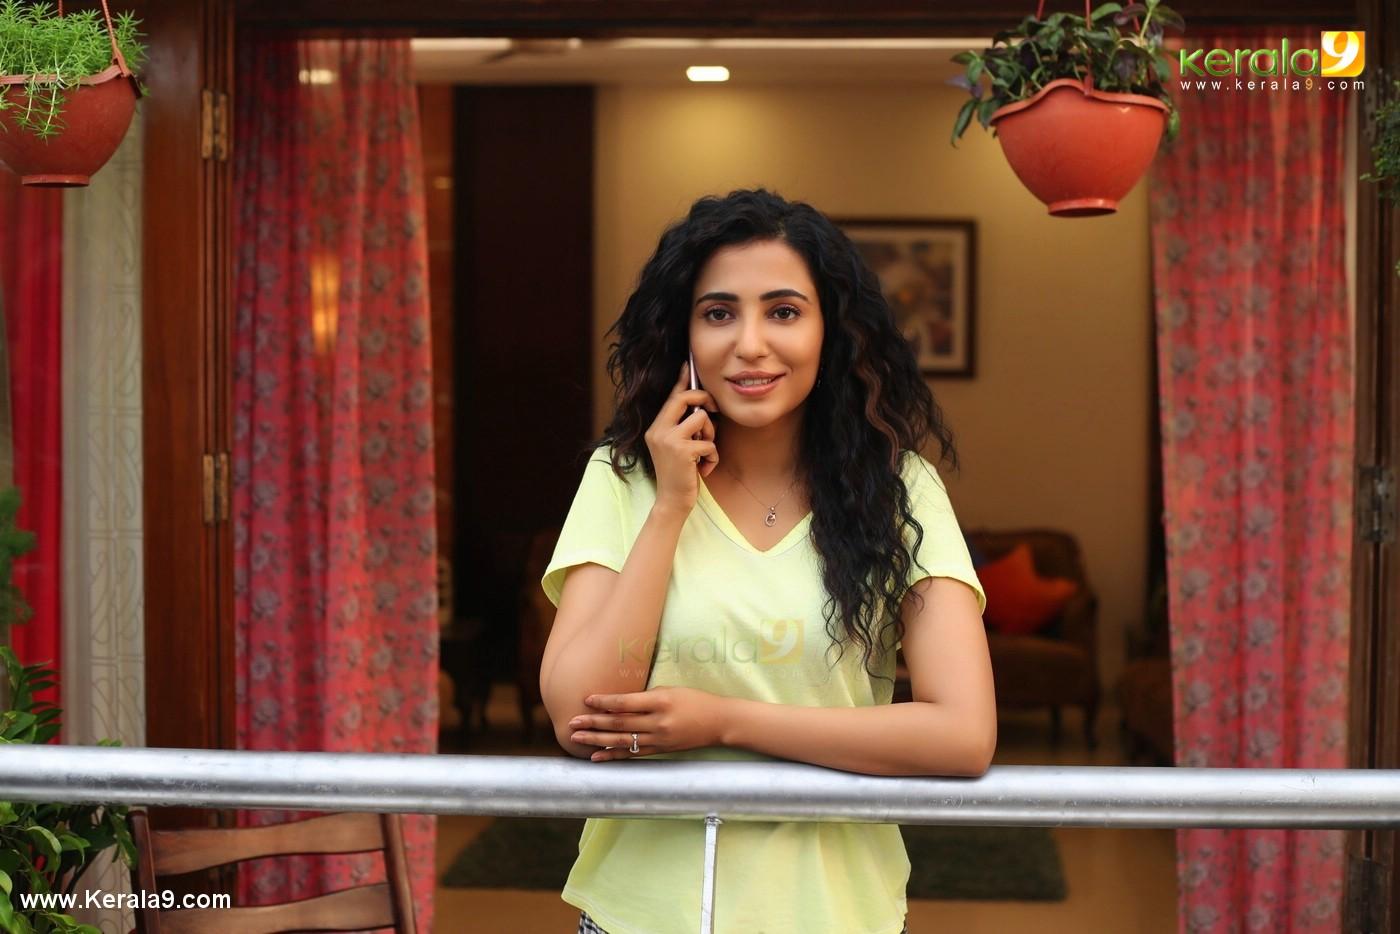 parvatii nair in neerali malayalam movie images 0923 9